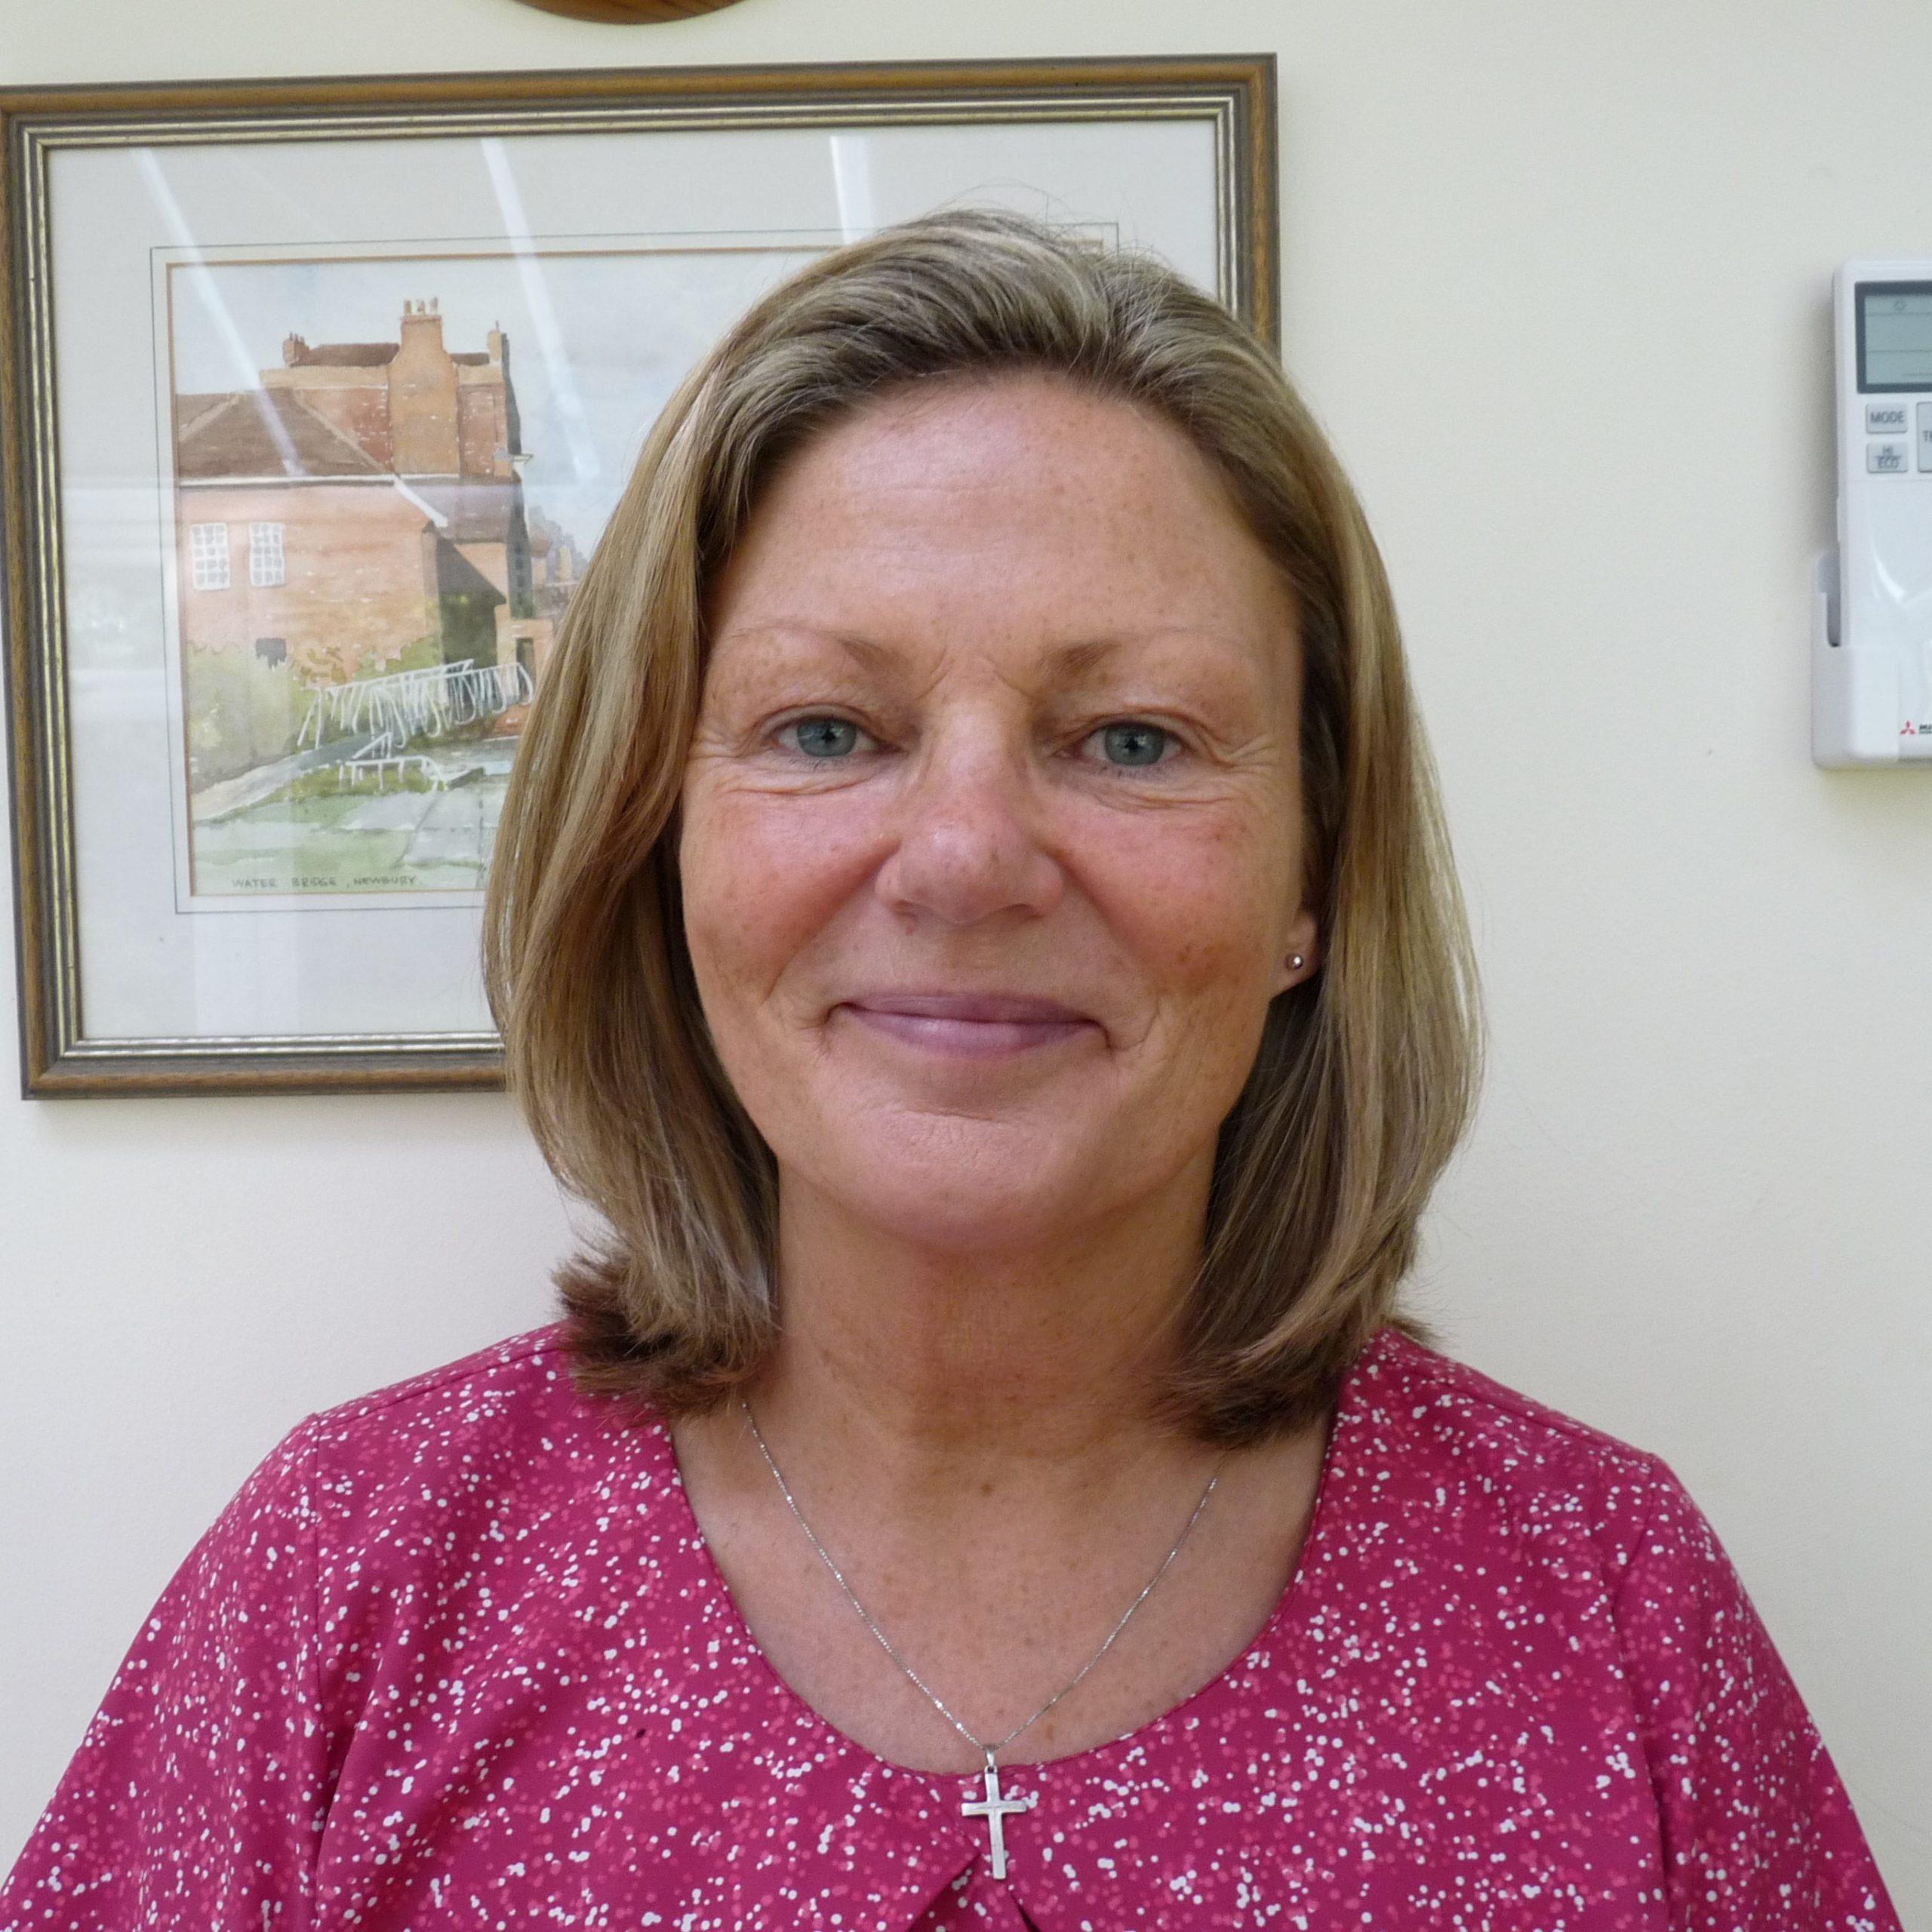 Jane Munro-Beeley